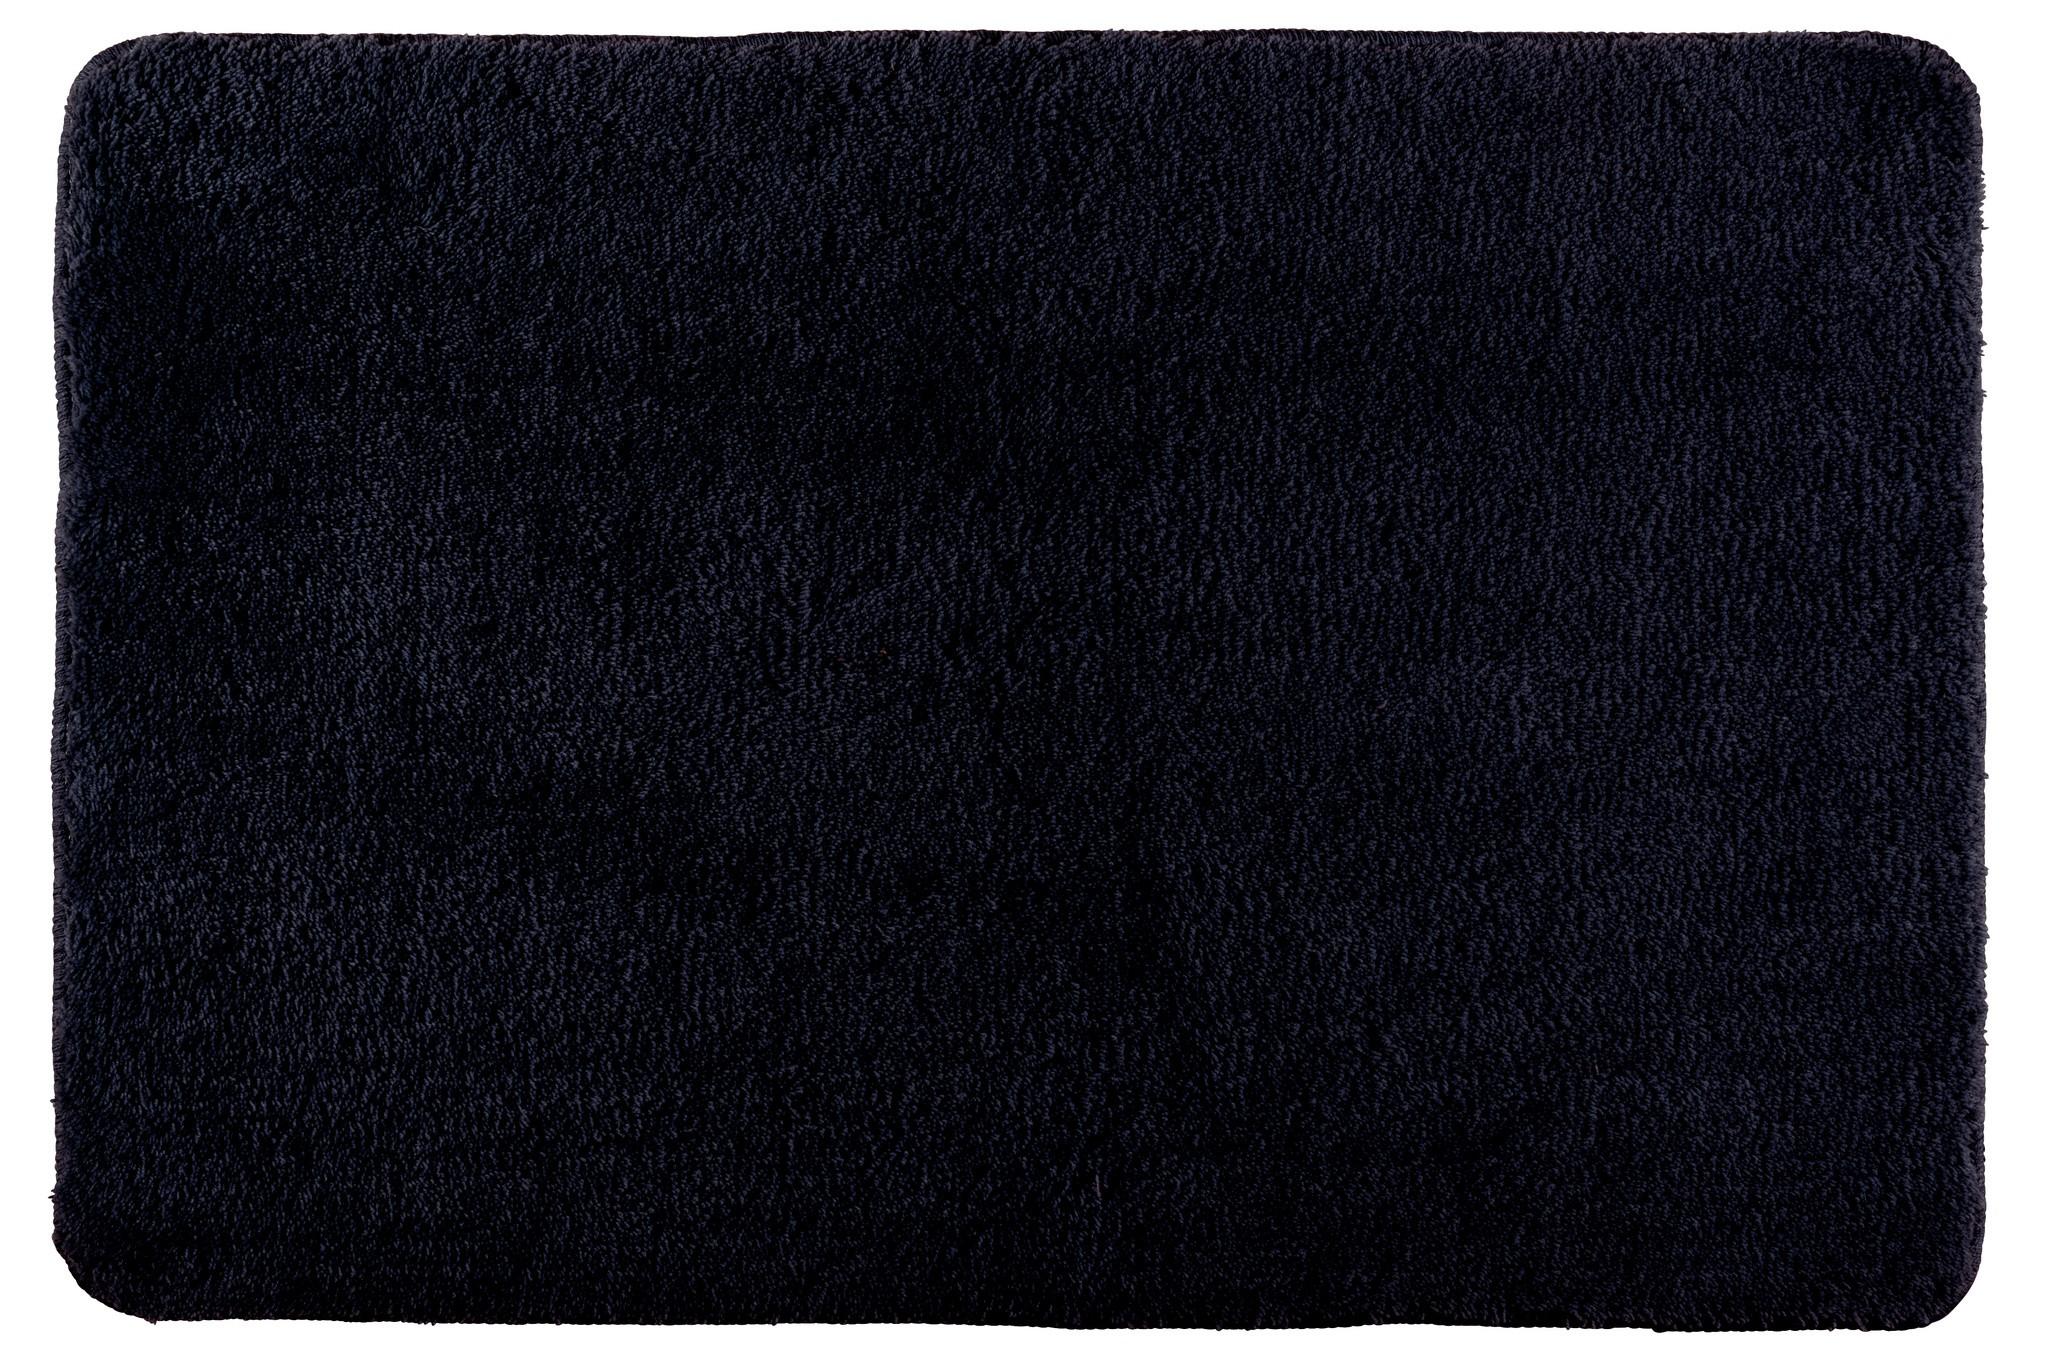 Badteppich Poly Black, 60 x 90 cm